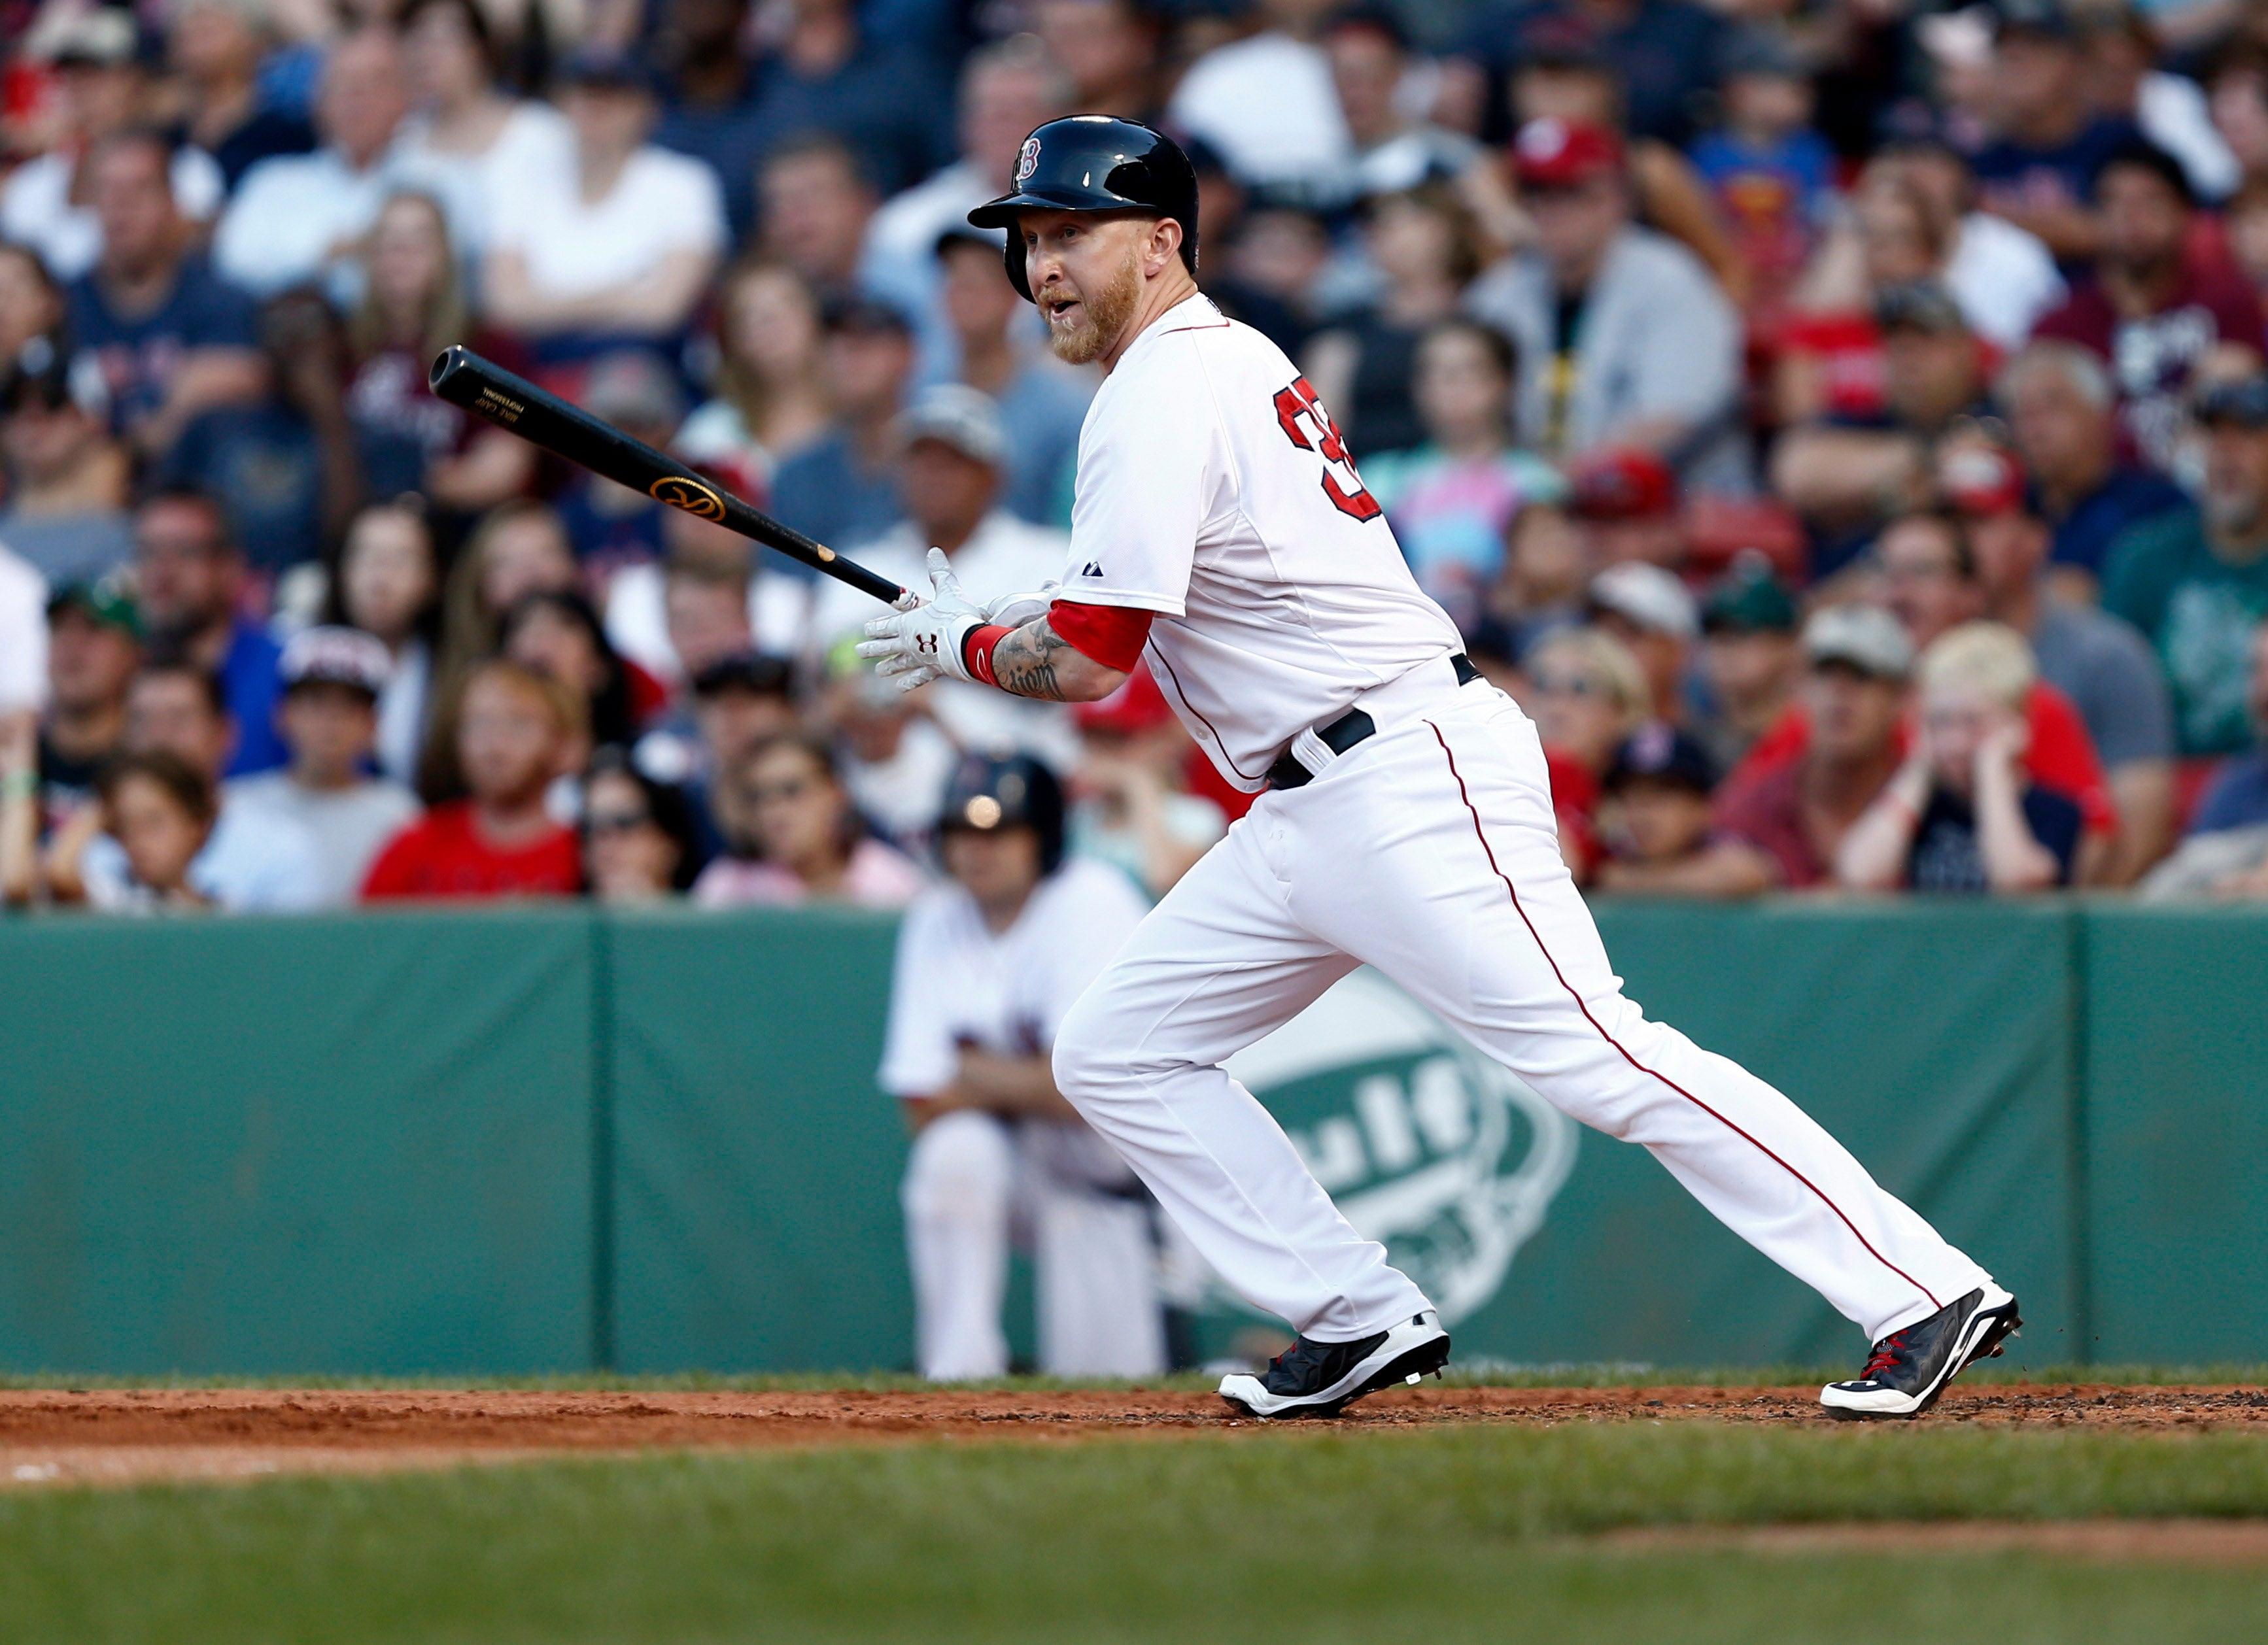 2014-07-10T234726Z_975831991_NOCID_RTRMADP_3_MLB-CHICAGO-WHITE-SOX-AT-BOSTON-RED-SOX-thumb-3468x2516-132529.jpg